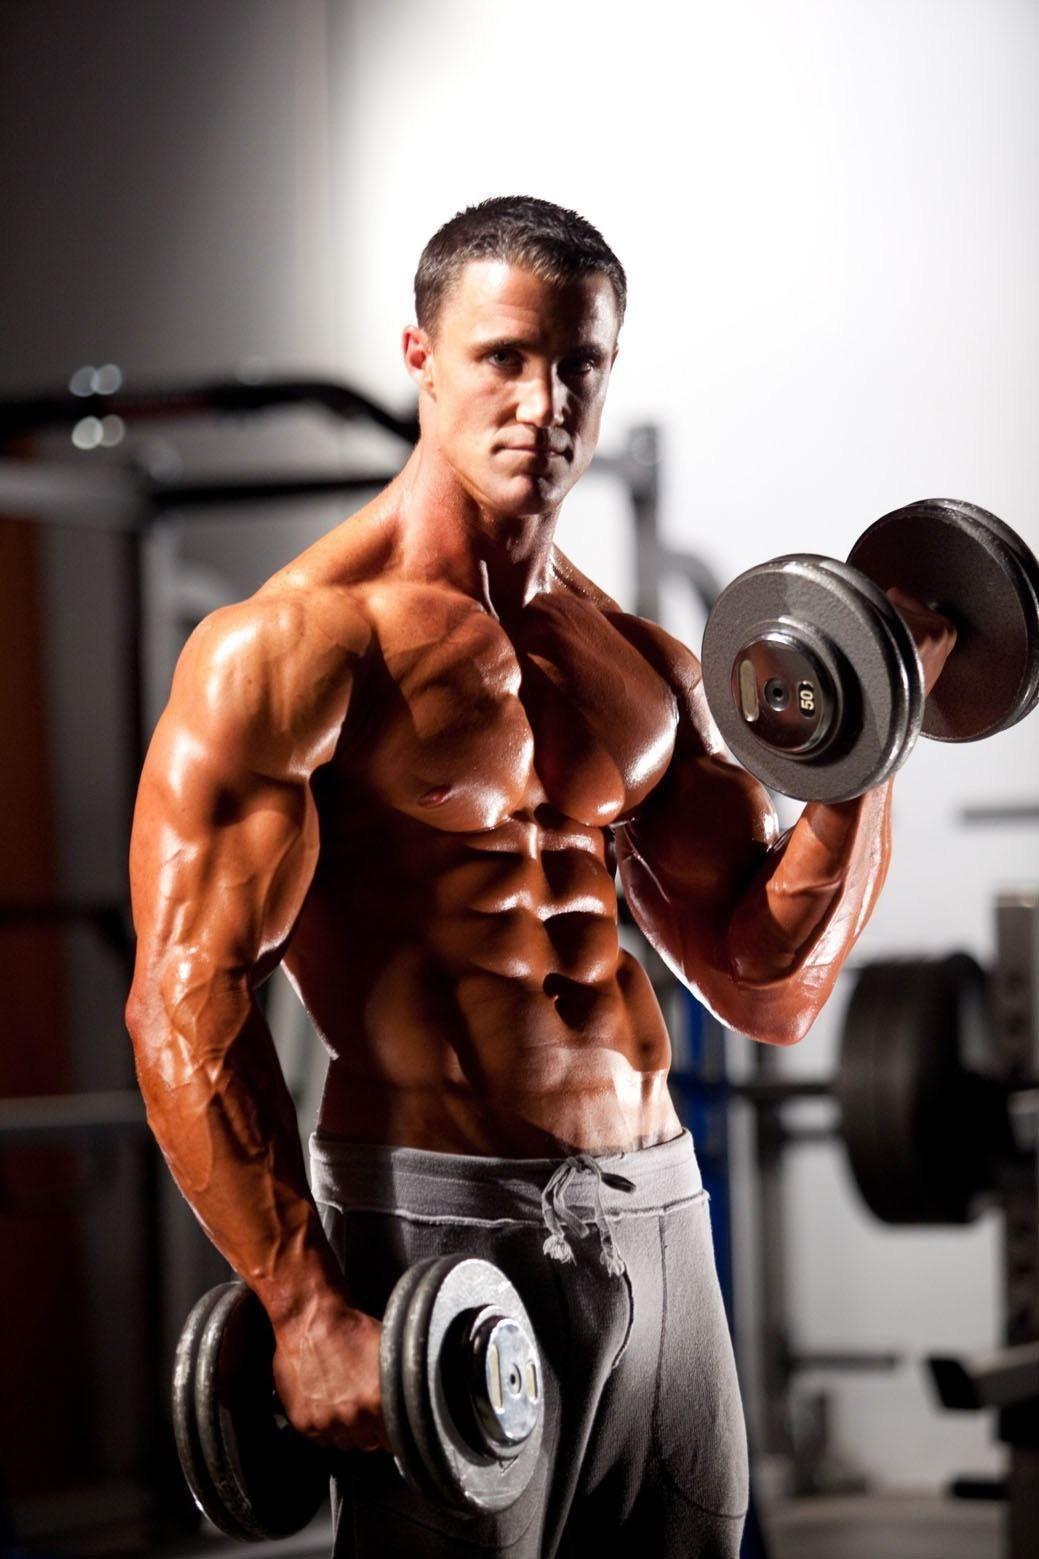 64170 Greg Plitt Fitness Model Strong Man Wall Poster Print Affiche